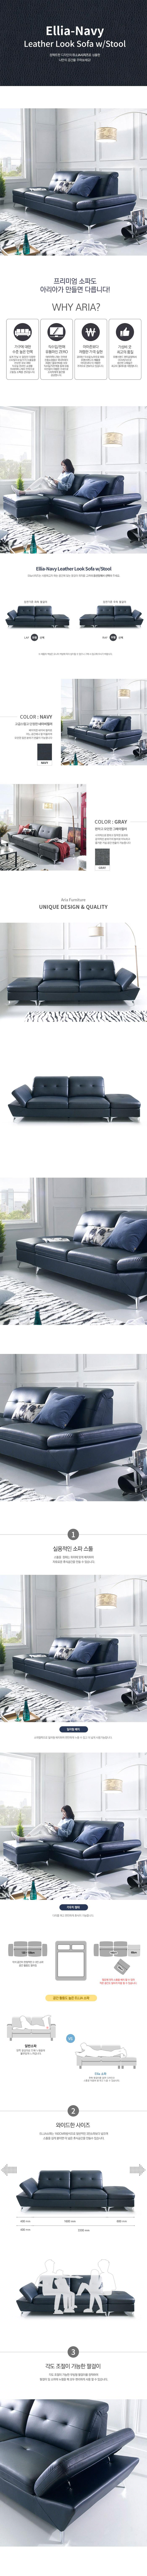 Ellia-Navy-Leather-Look-Sofa_1.jpg